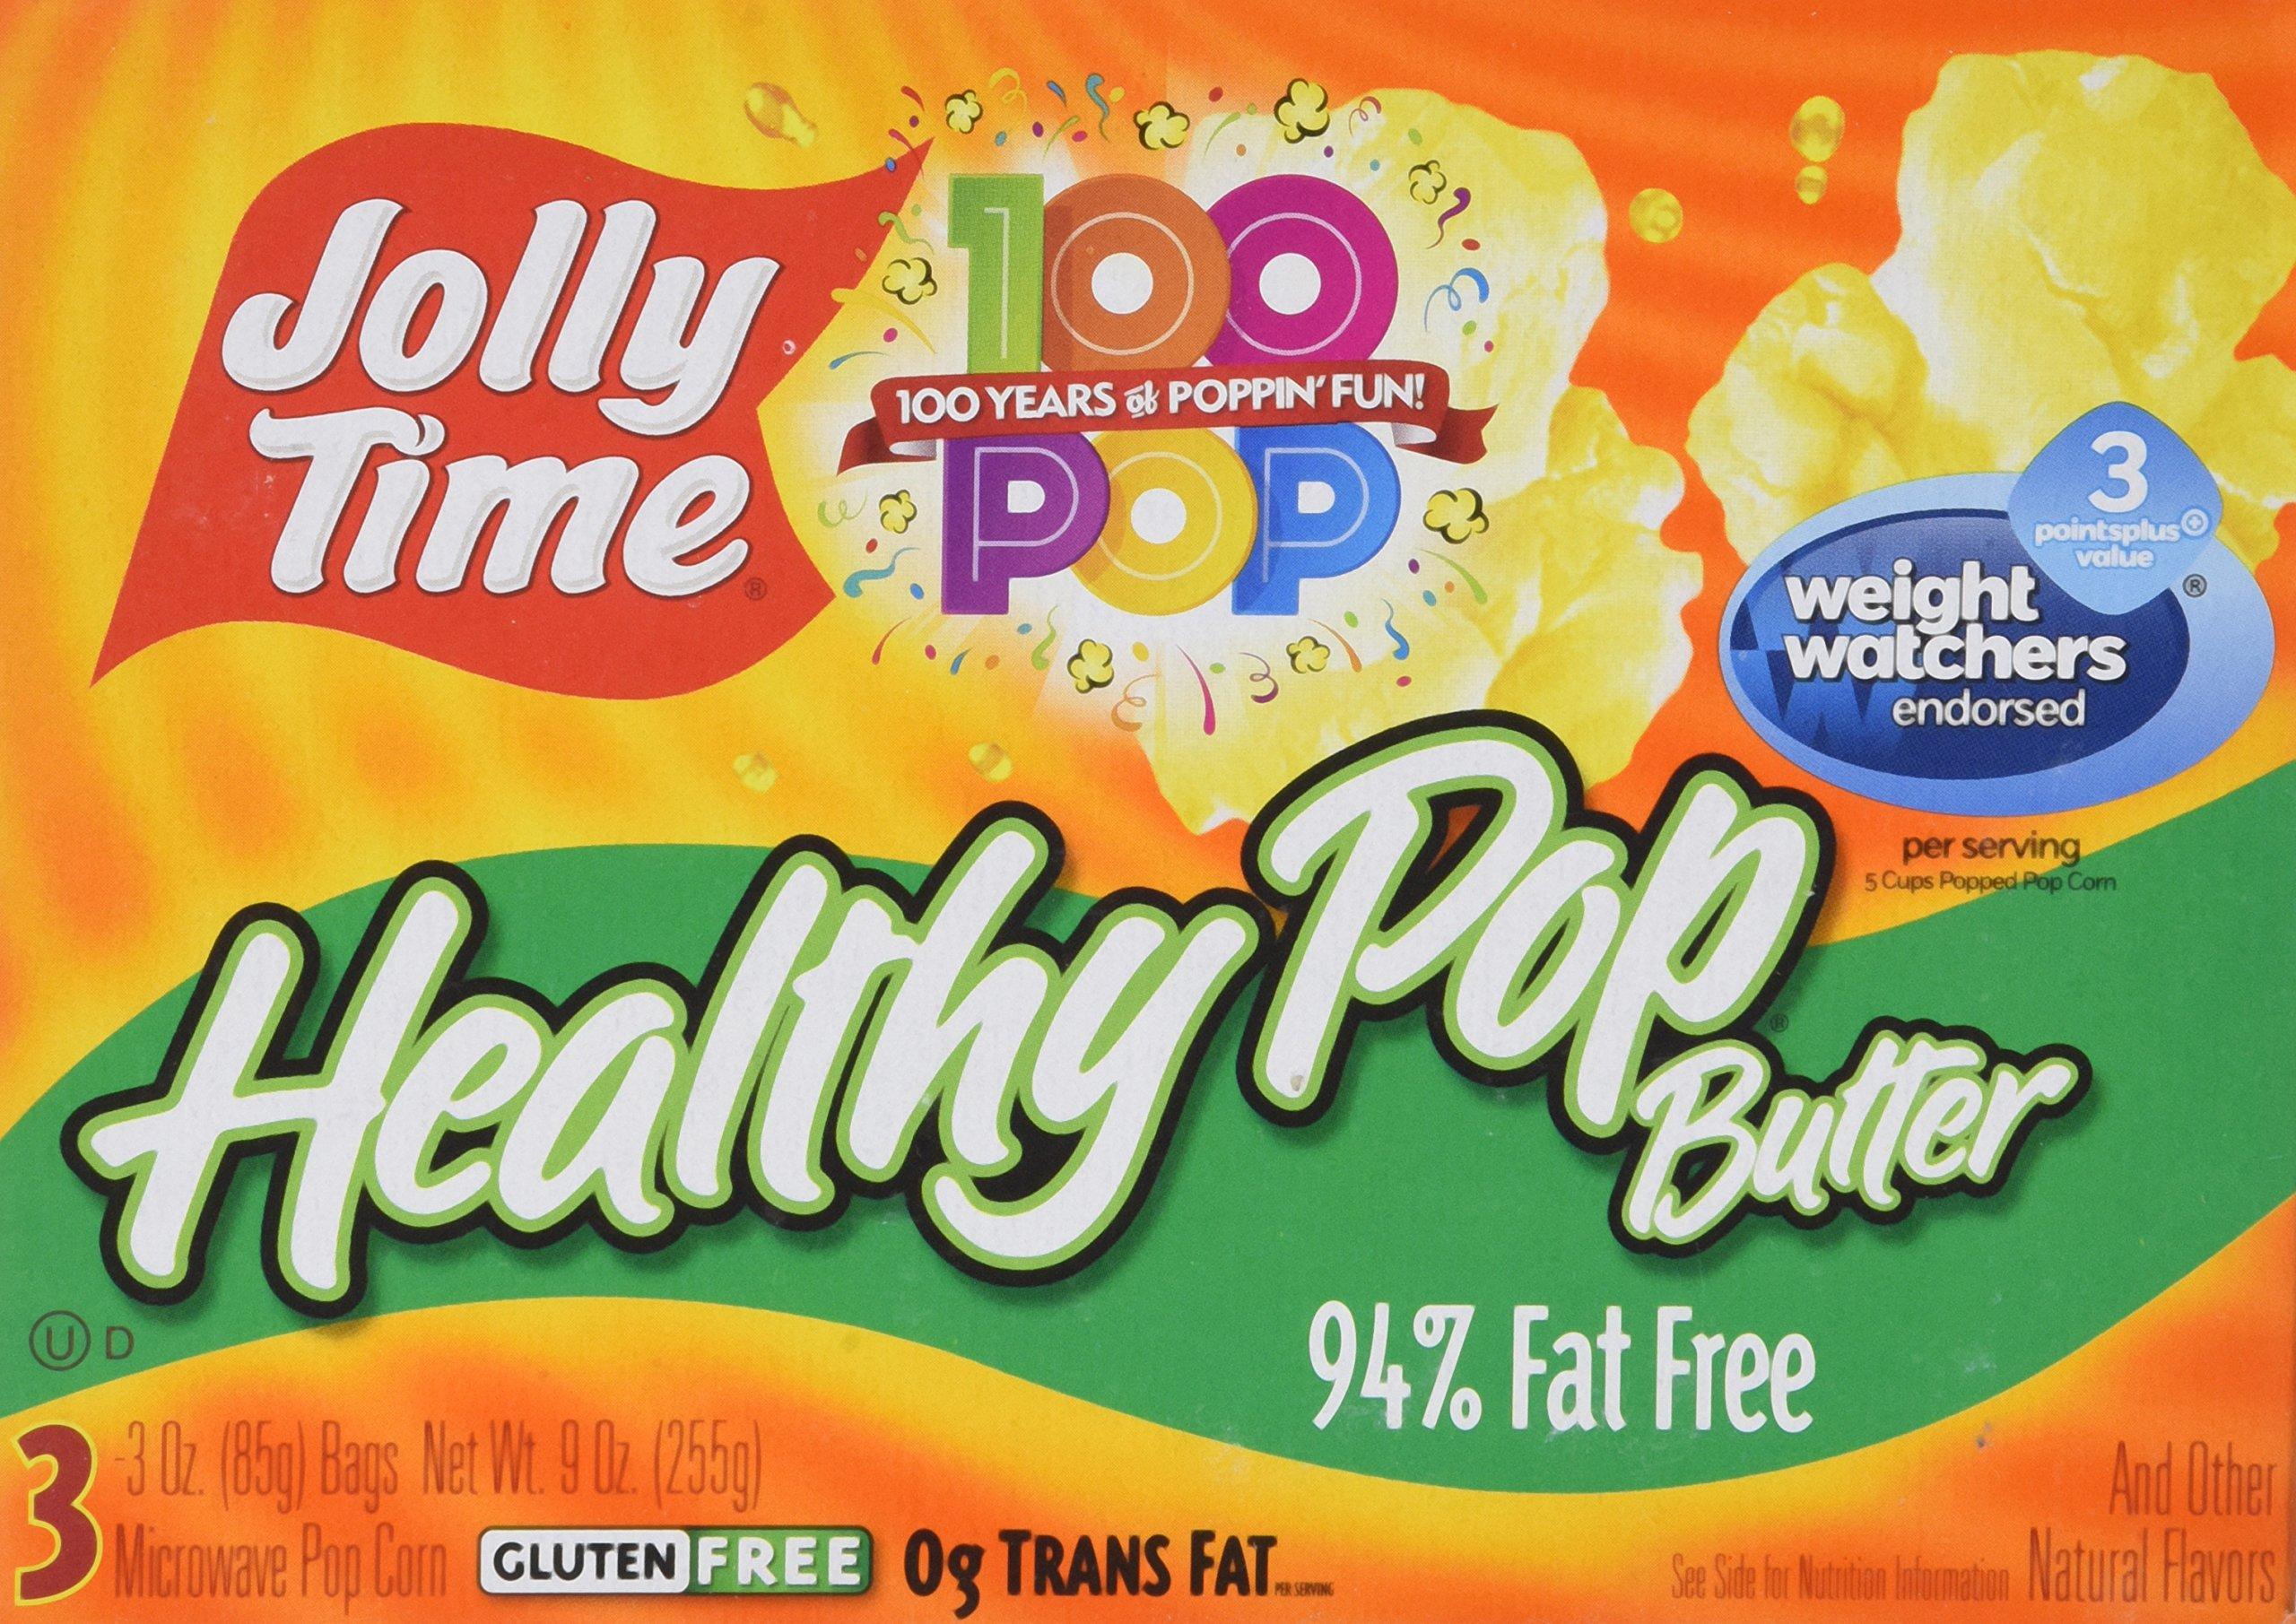 Jolly Time Healthy Pop Microwave Popcorn, 3 ct, 2 pk